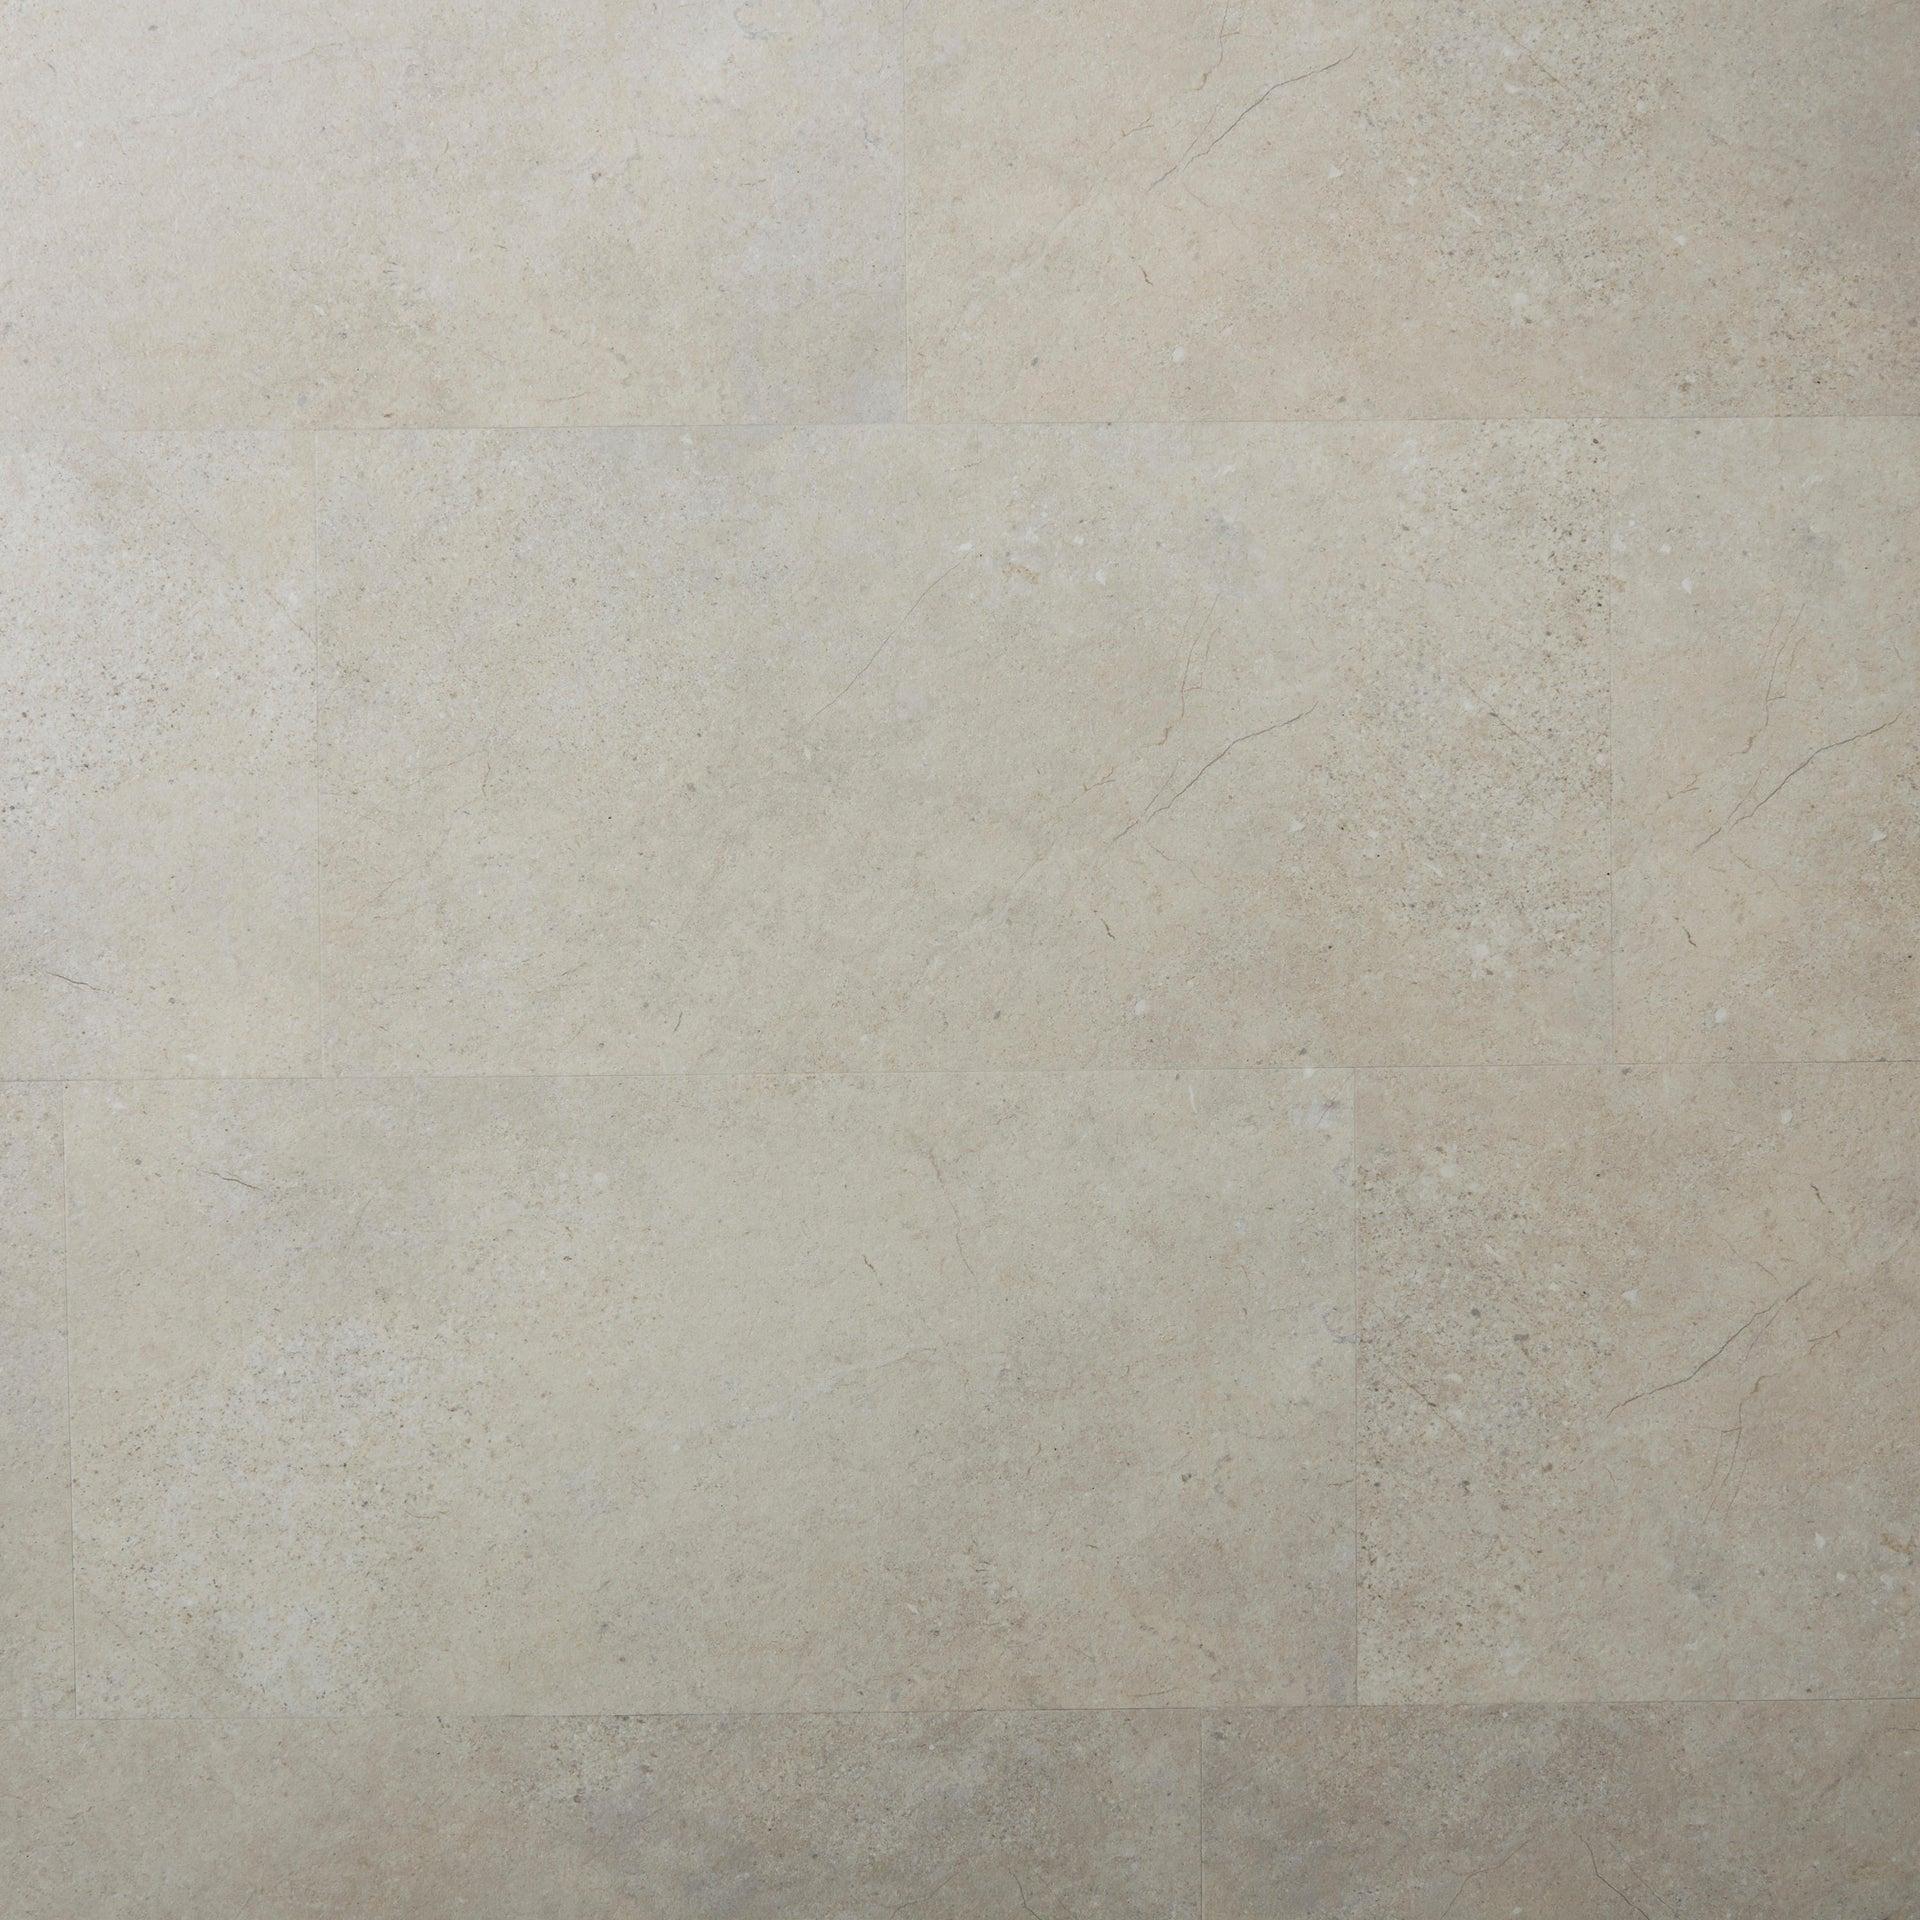 Pavimento PVC adesivo Limestone Sp 2 mm grigio / argento - 6